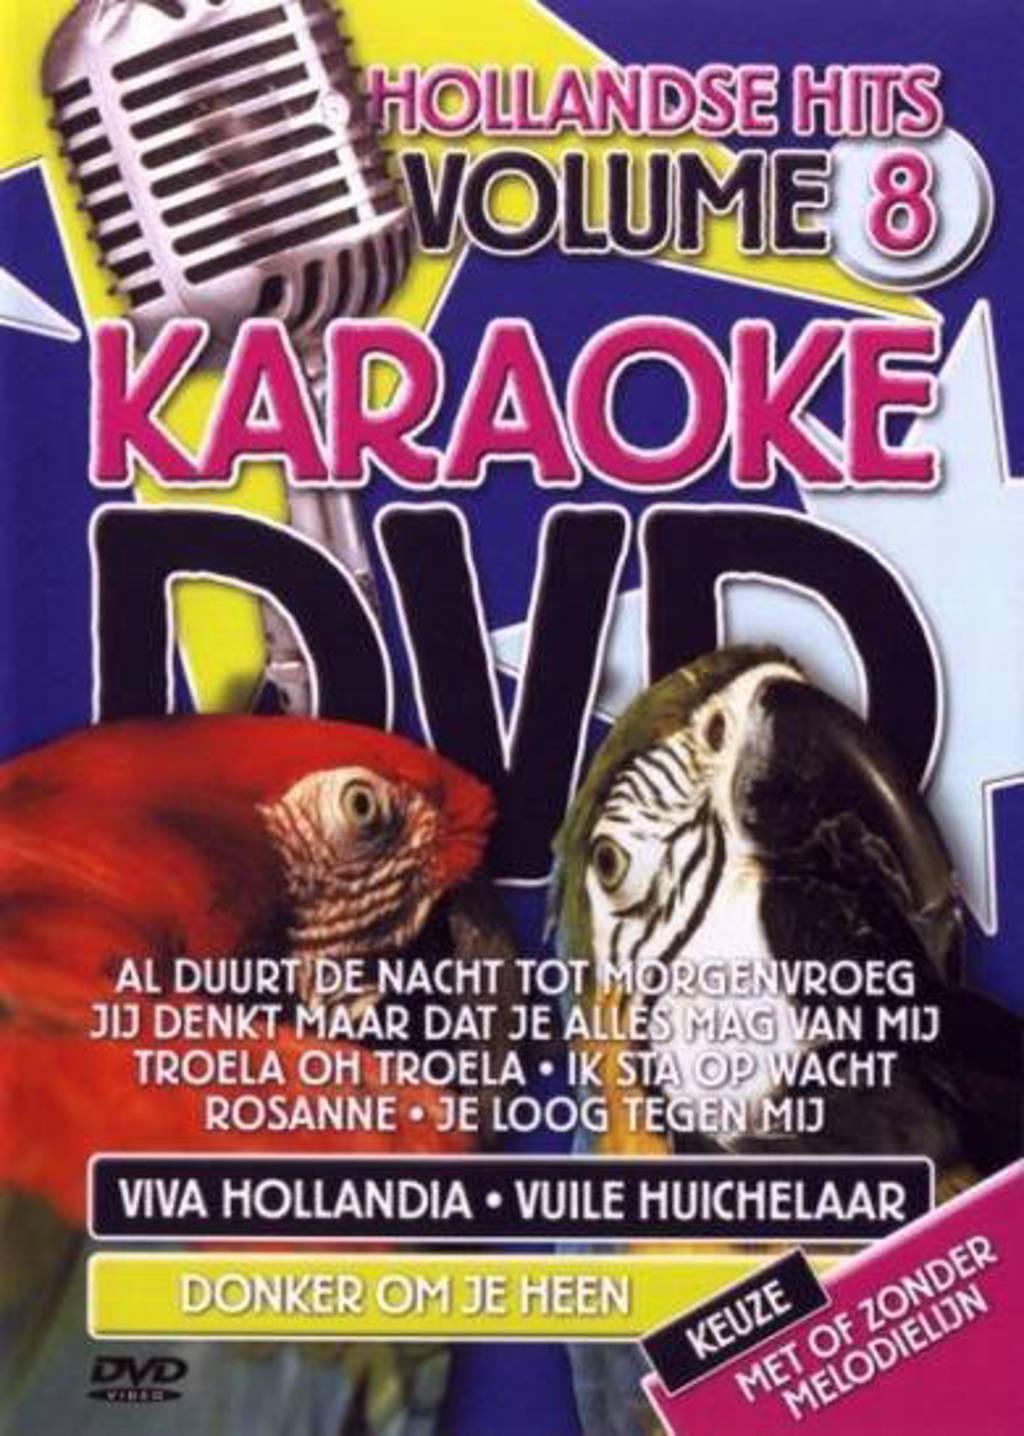 Karaoke dvd - Hollandse hits 8 (DVD)